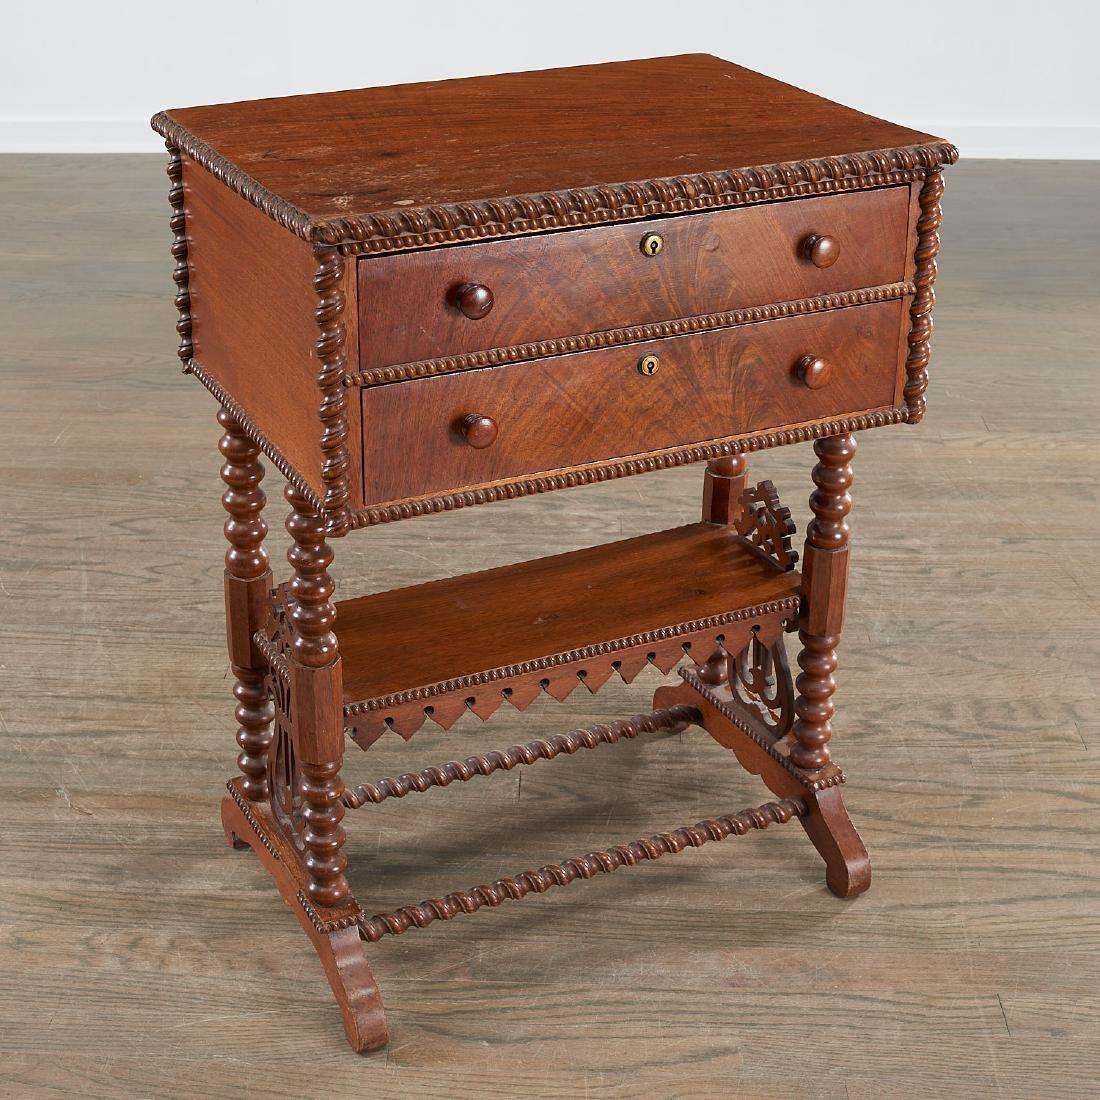 American Aesthetic mahogany work table